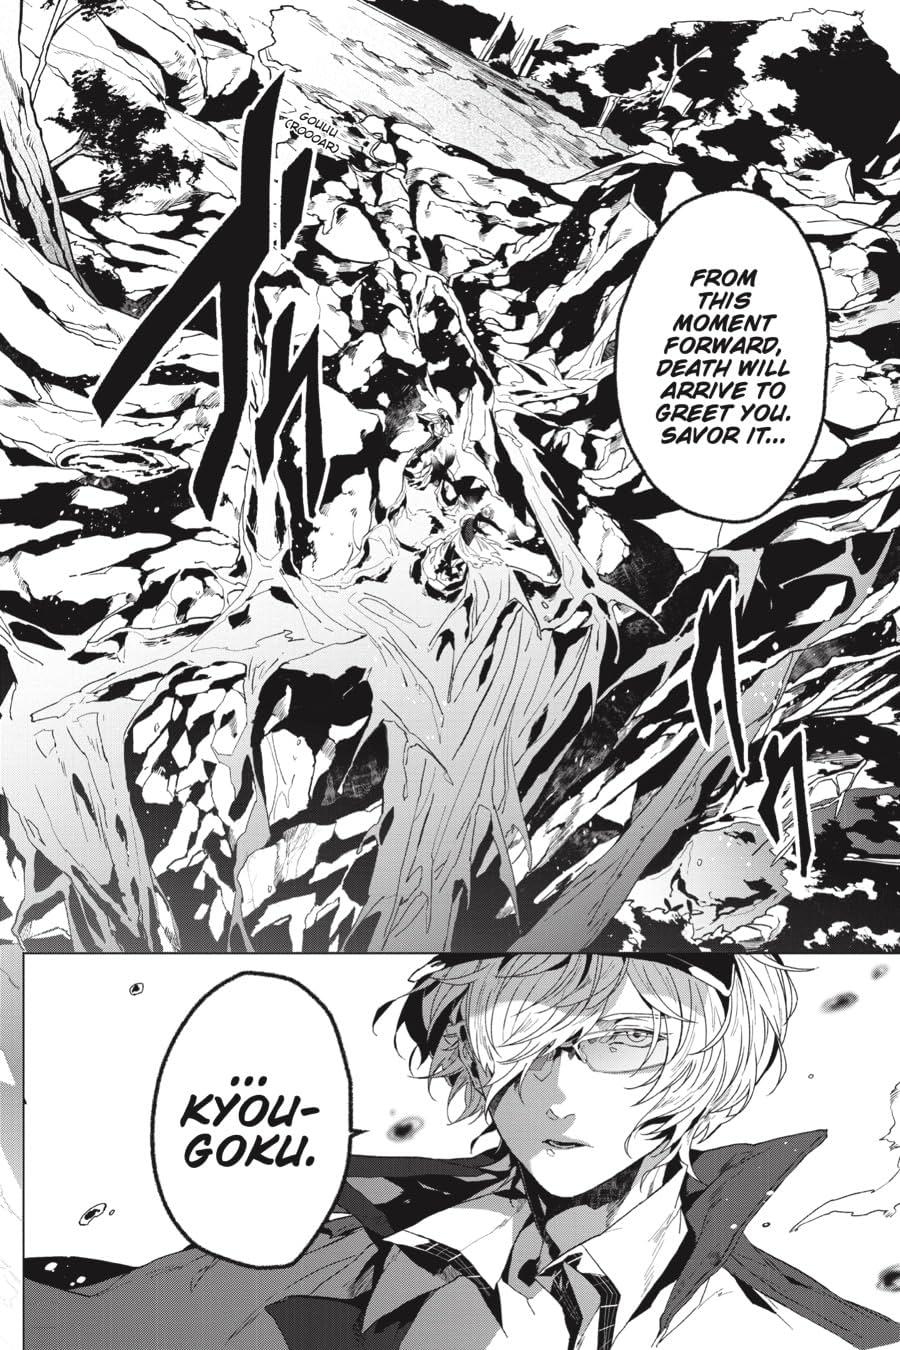 Bungo Stray Dogs: Another Story Vol. 1: Yukito Ayatsuji vs. Natsuhiko Kyogoku